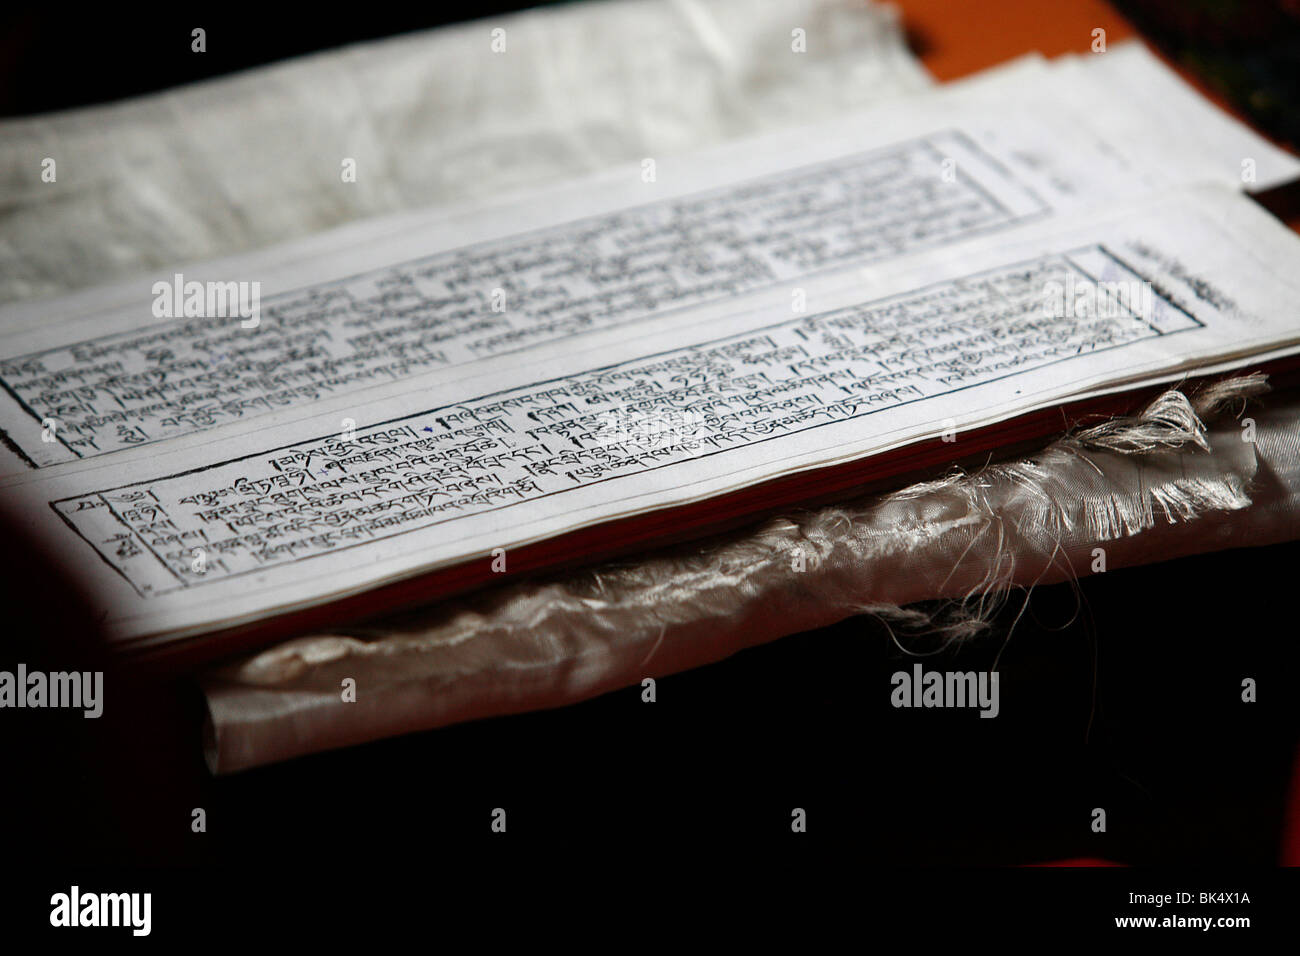 Tibetan scripture tablets, Kathmandu, Nepal, Asia - Stock Image